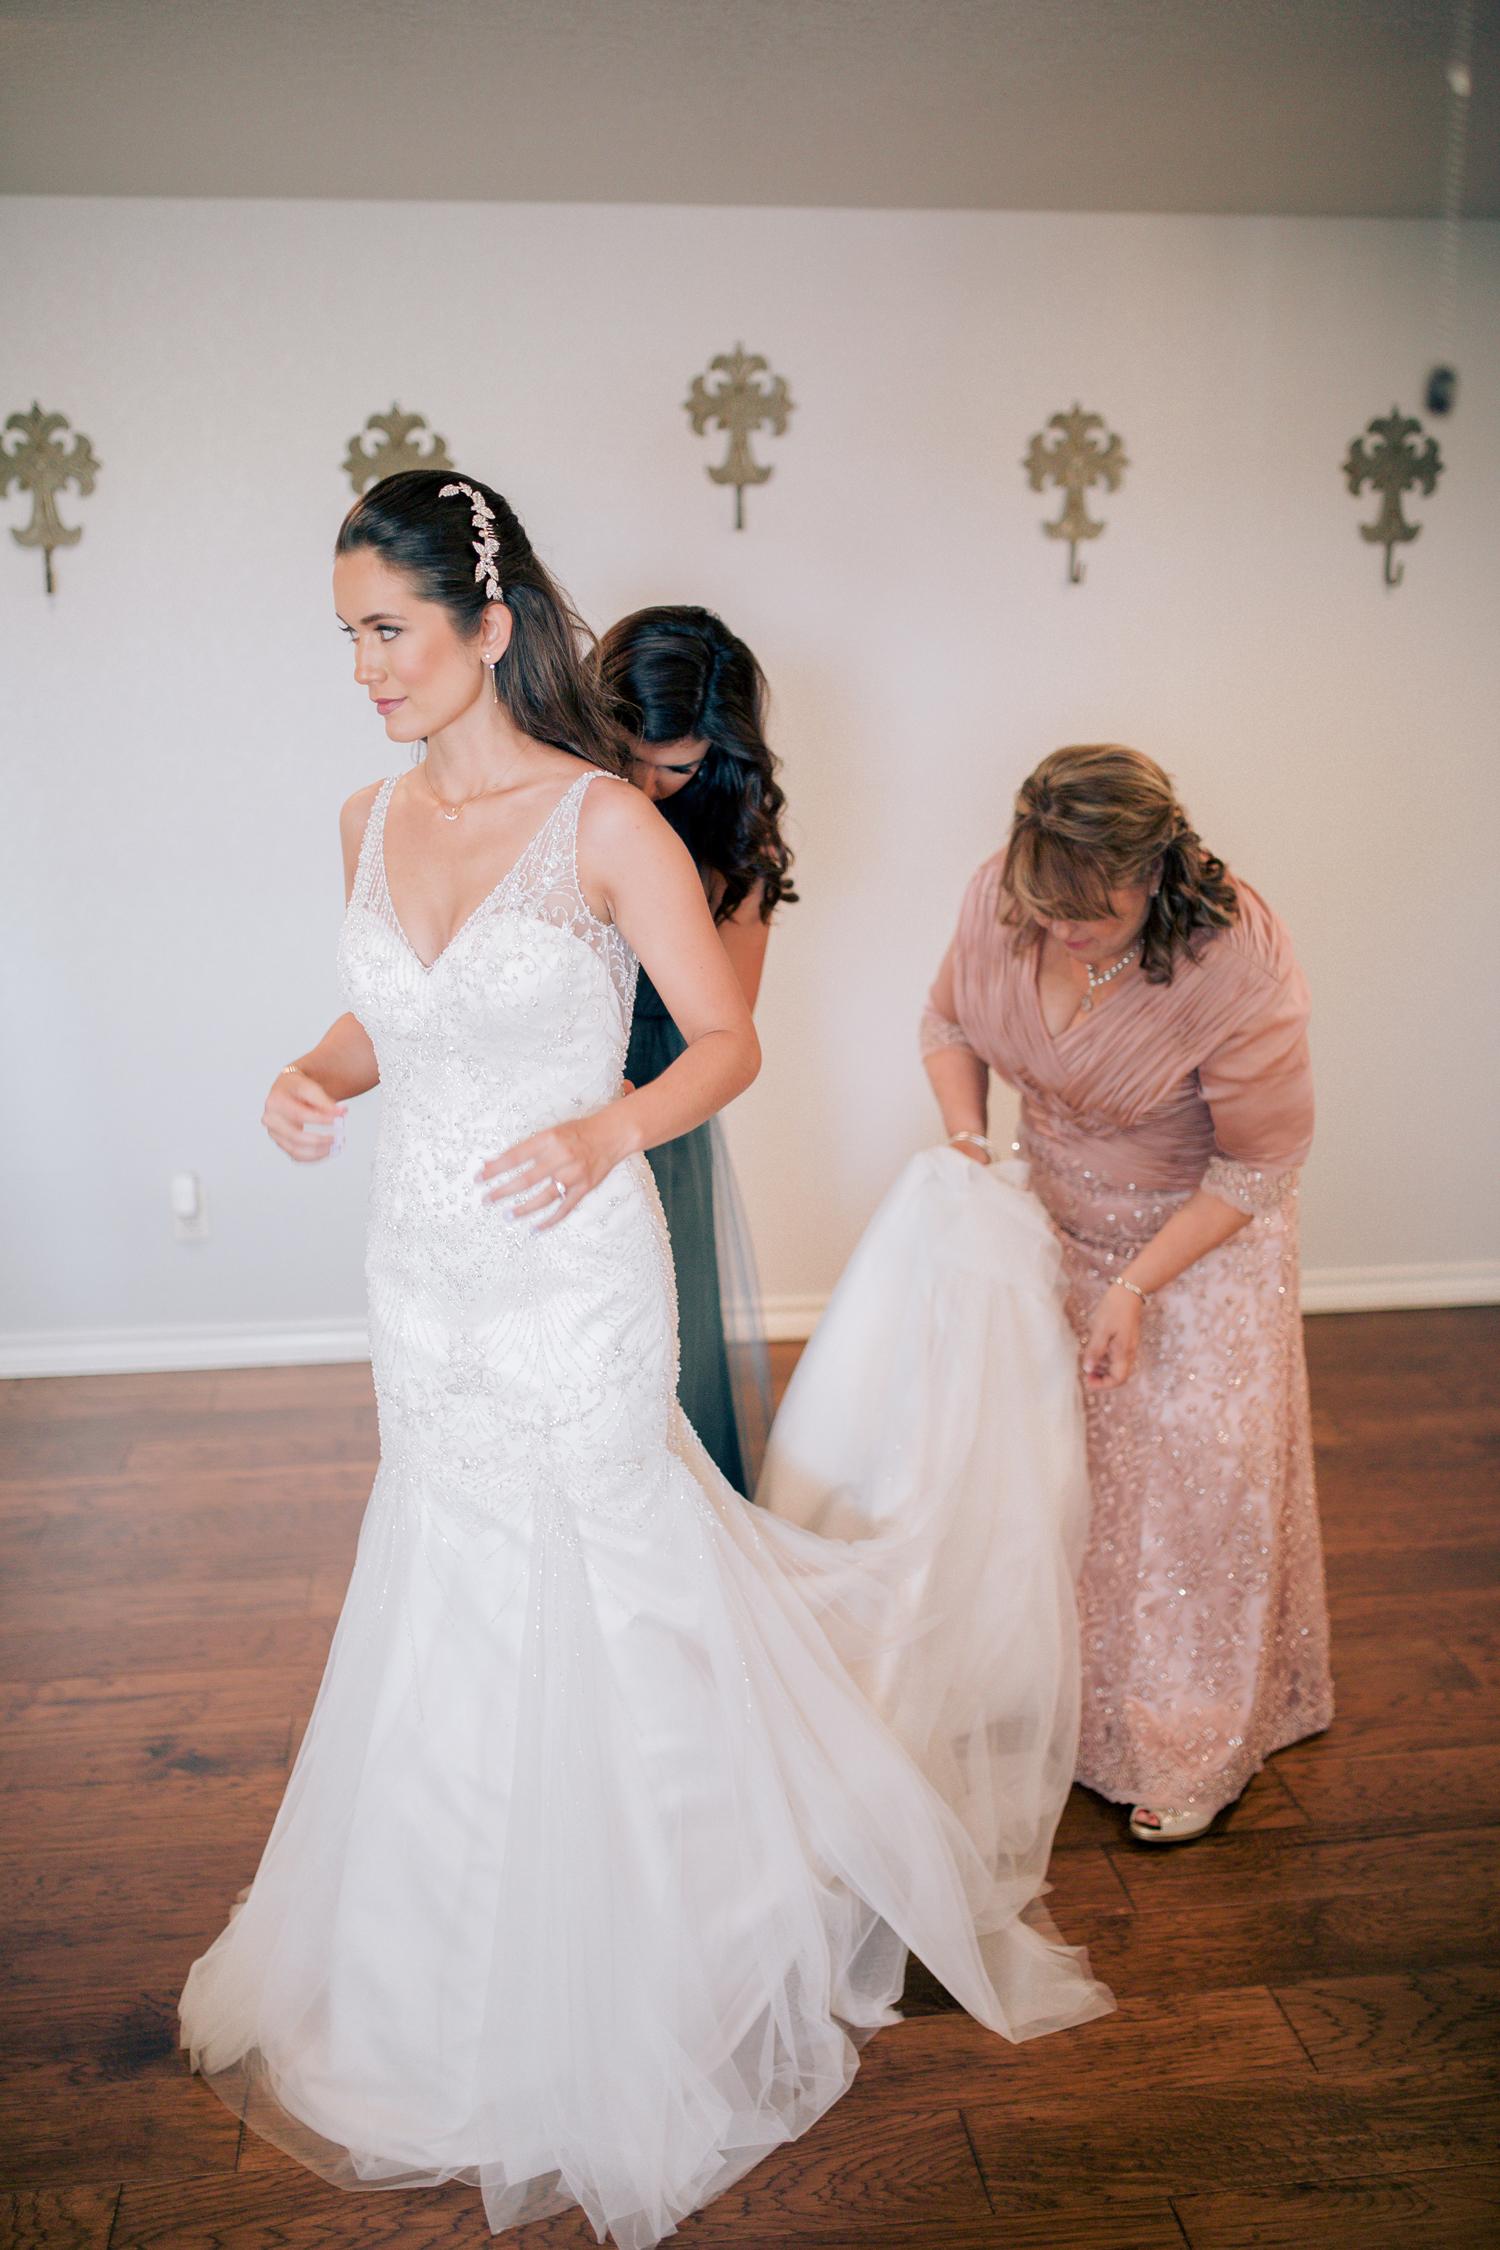 alaa-marzouk-photography-rgvweddingphotographer-rio-grande-valley-mathis-wedding-bridal-bride-san-antonio-portrait-weddings-mcallen-75.jpg